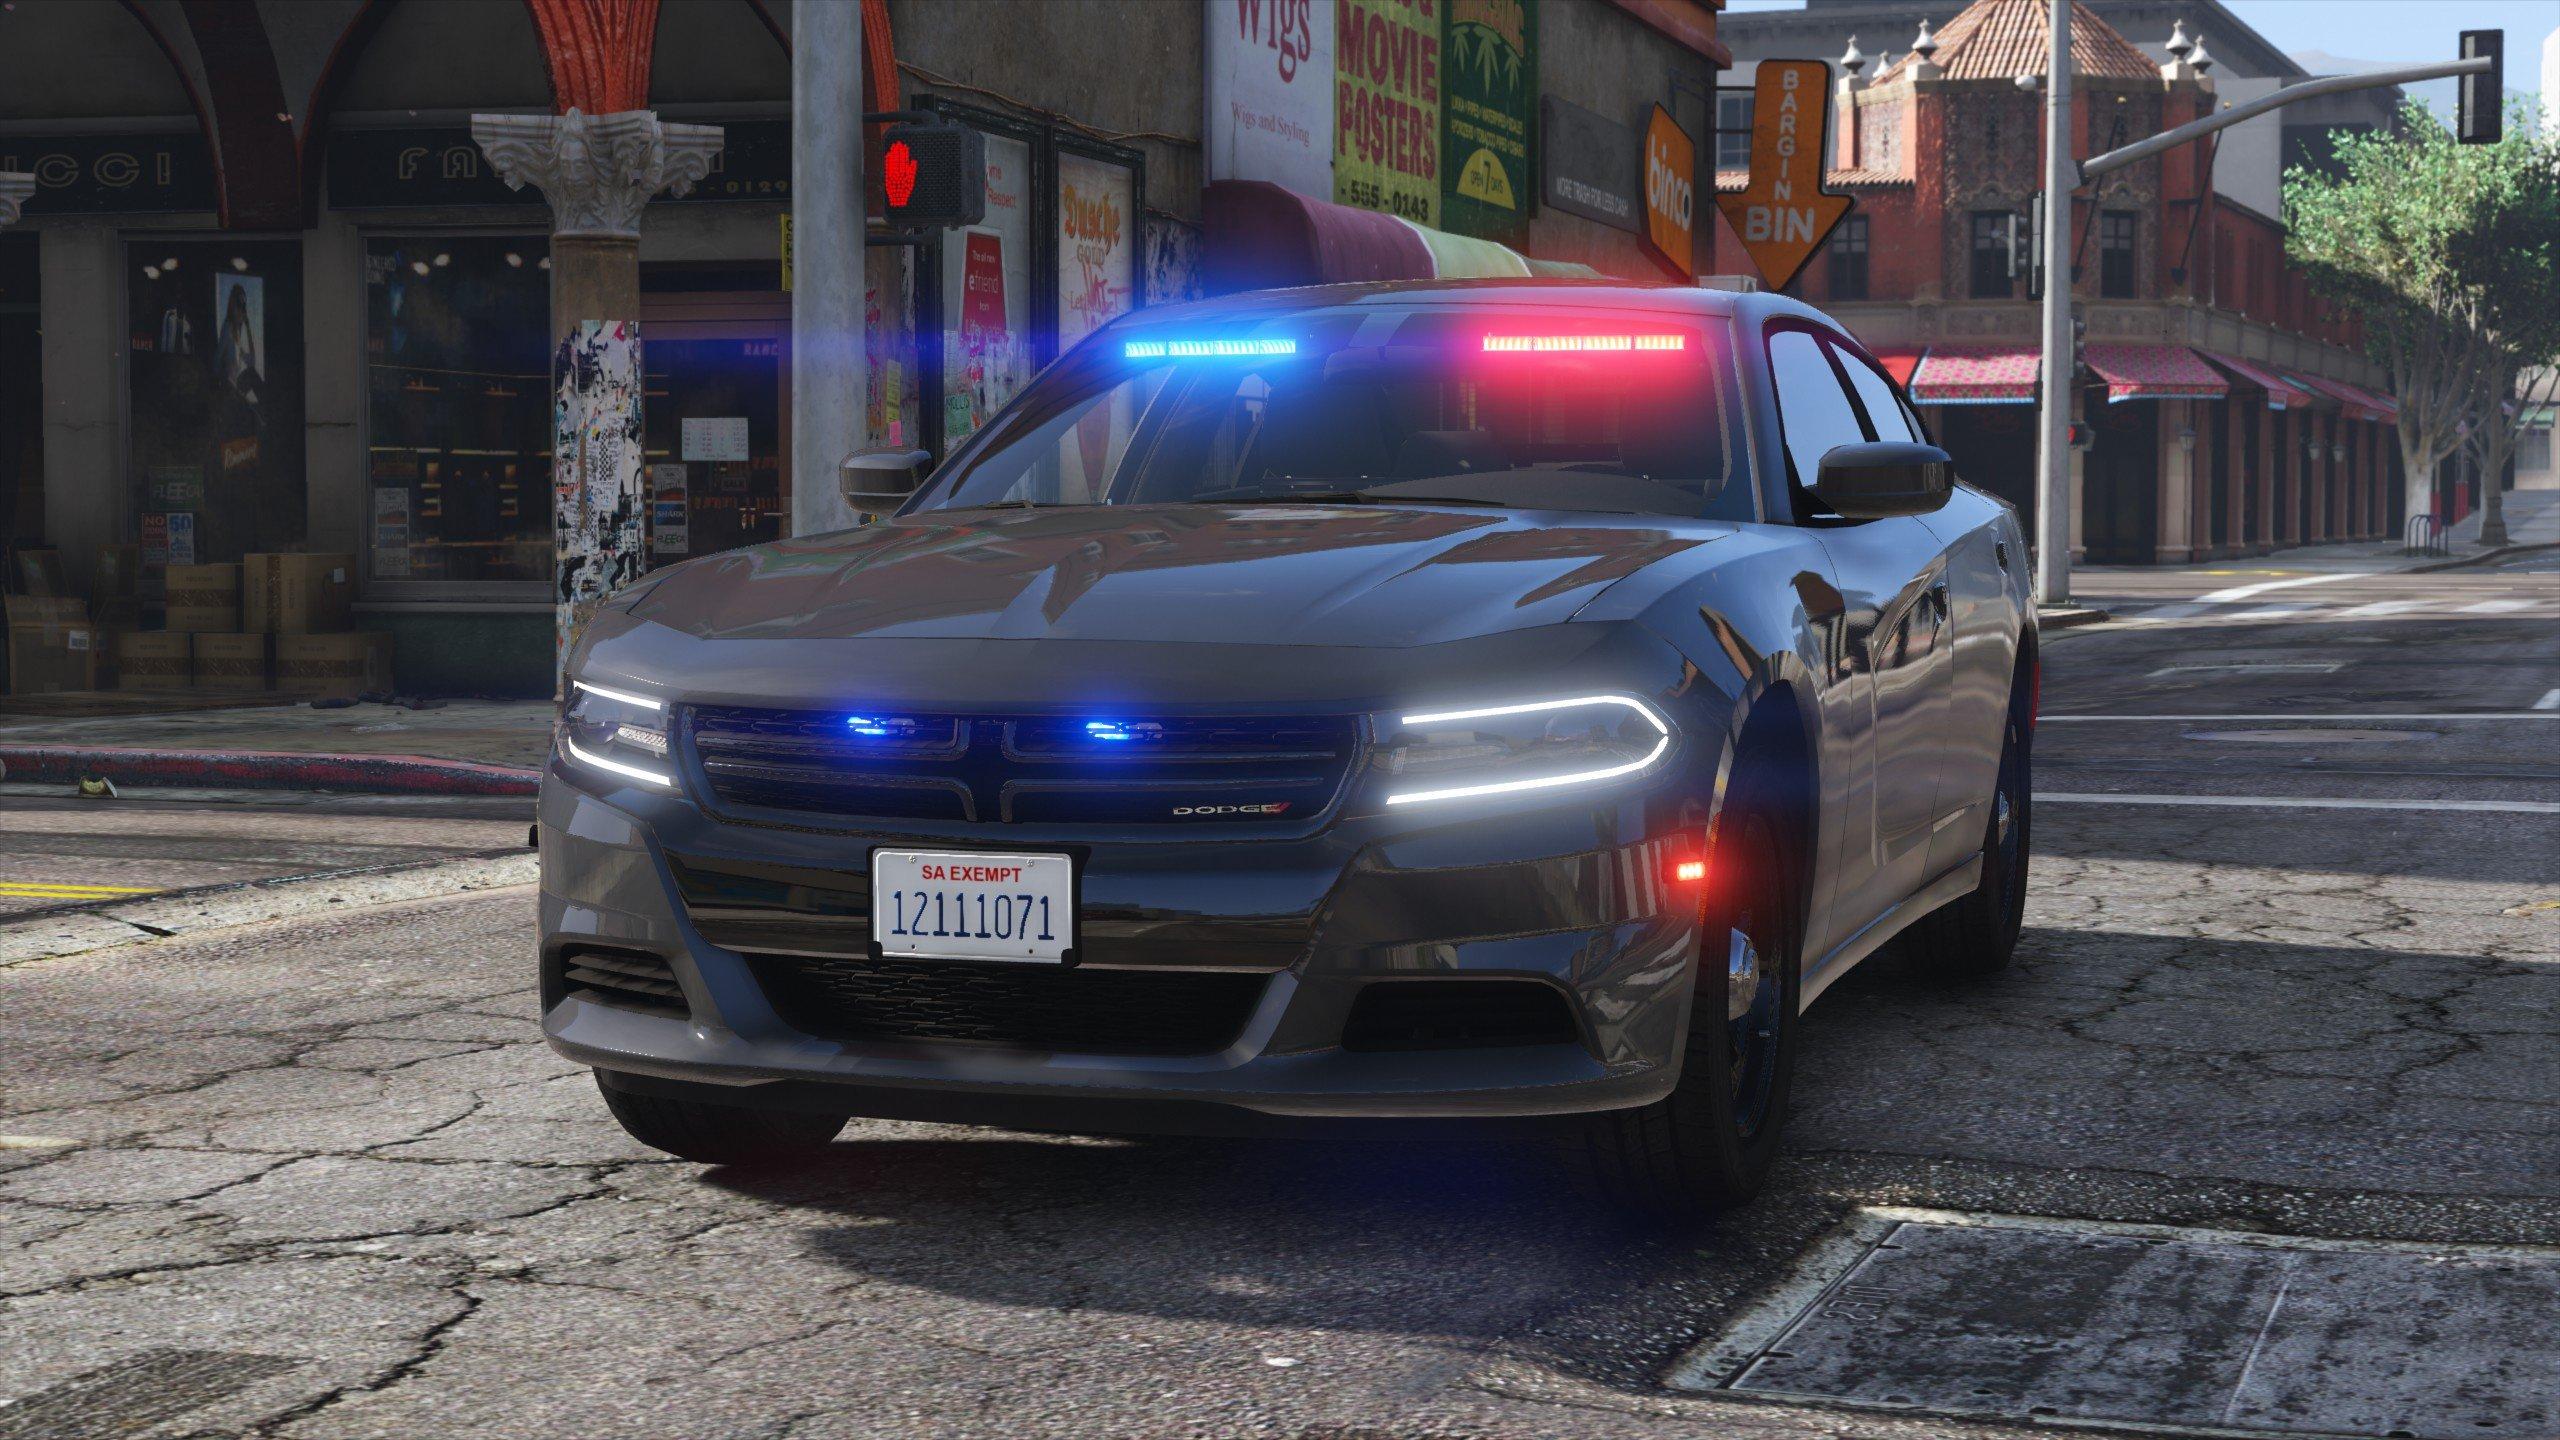 2018 Dodge Charger Los Santos Police Department Lspd